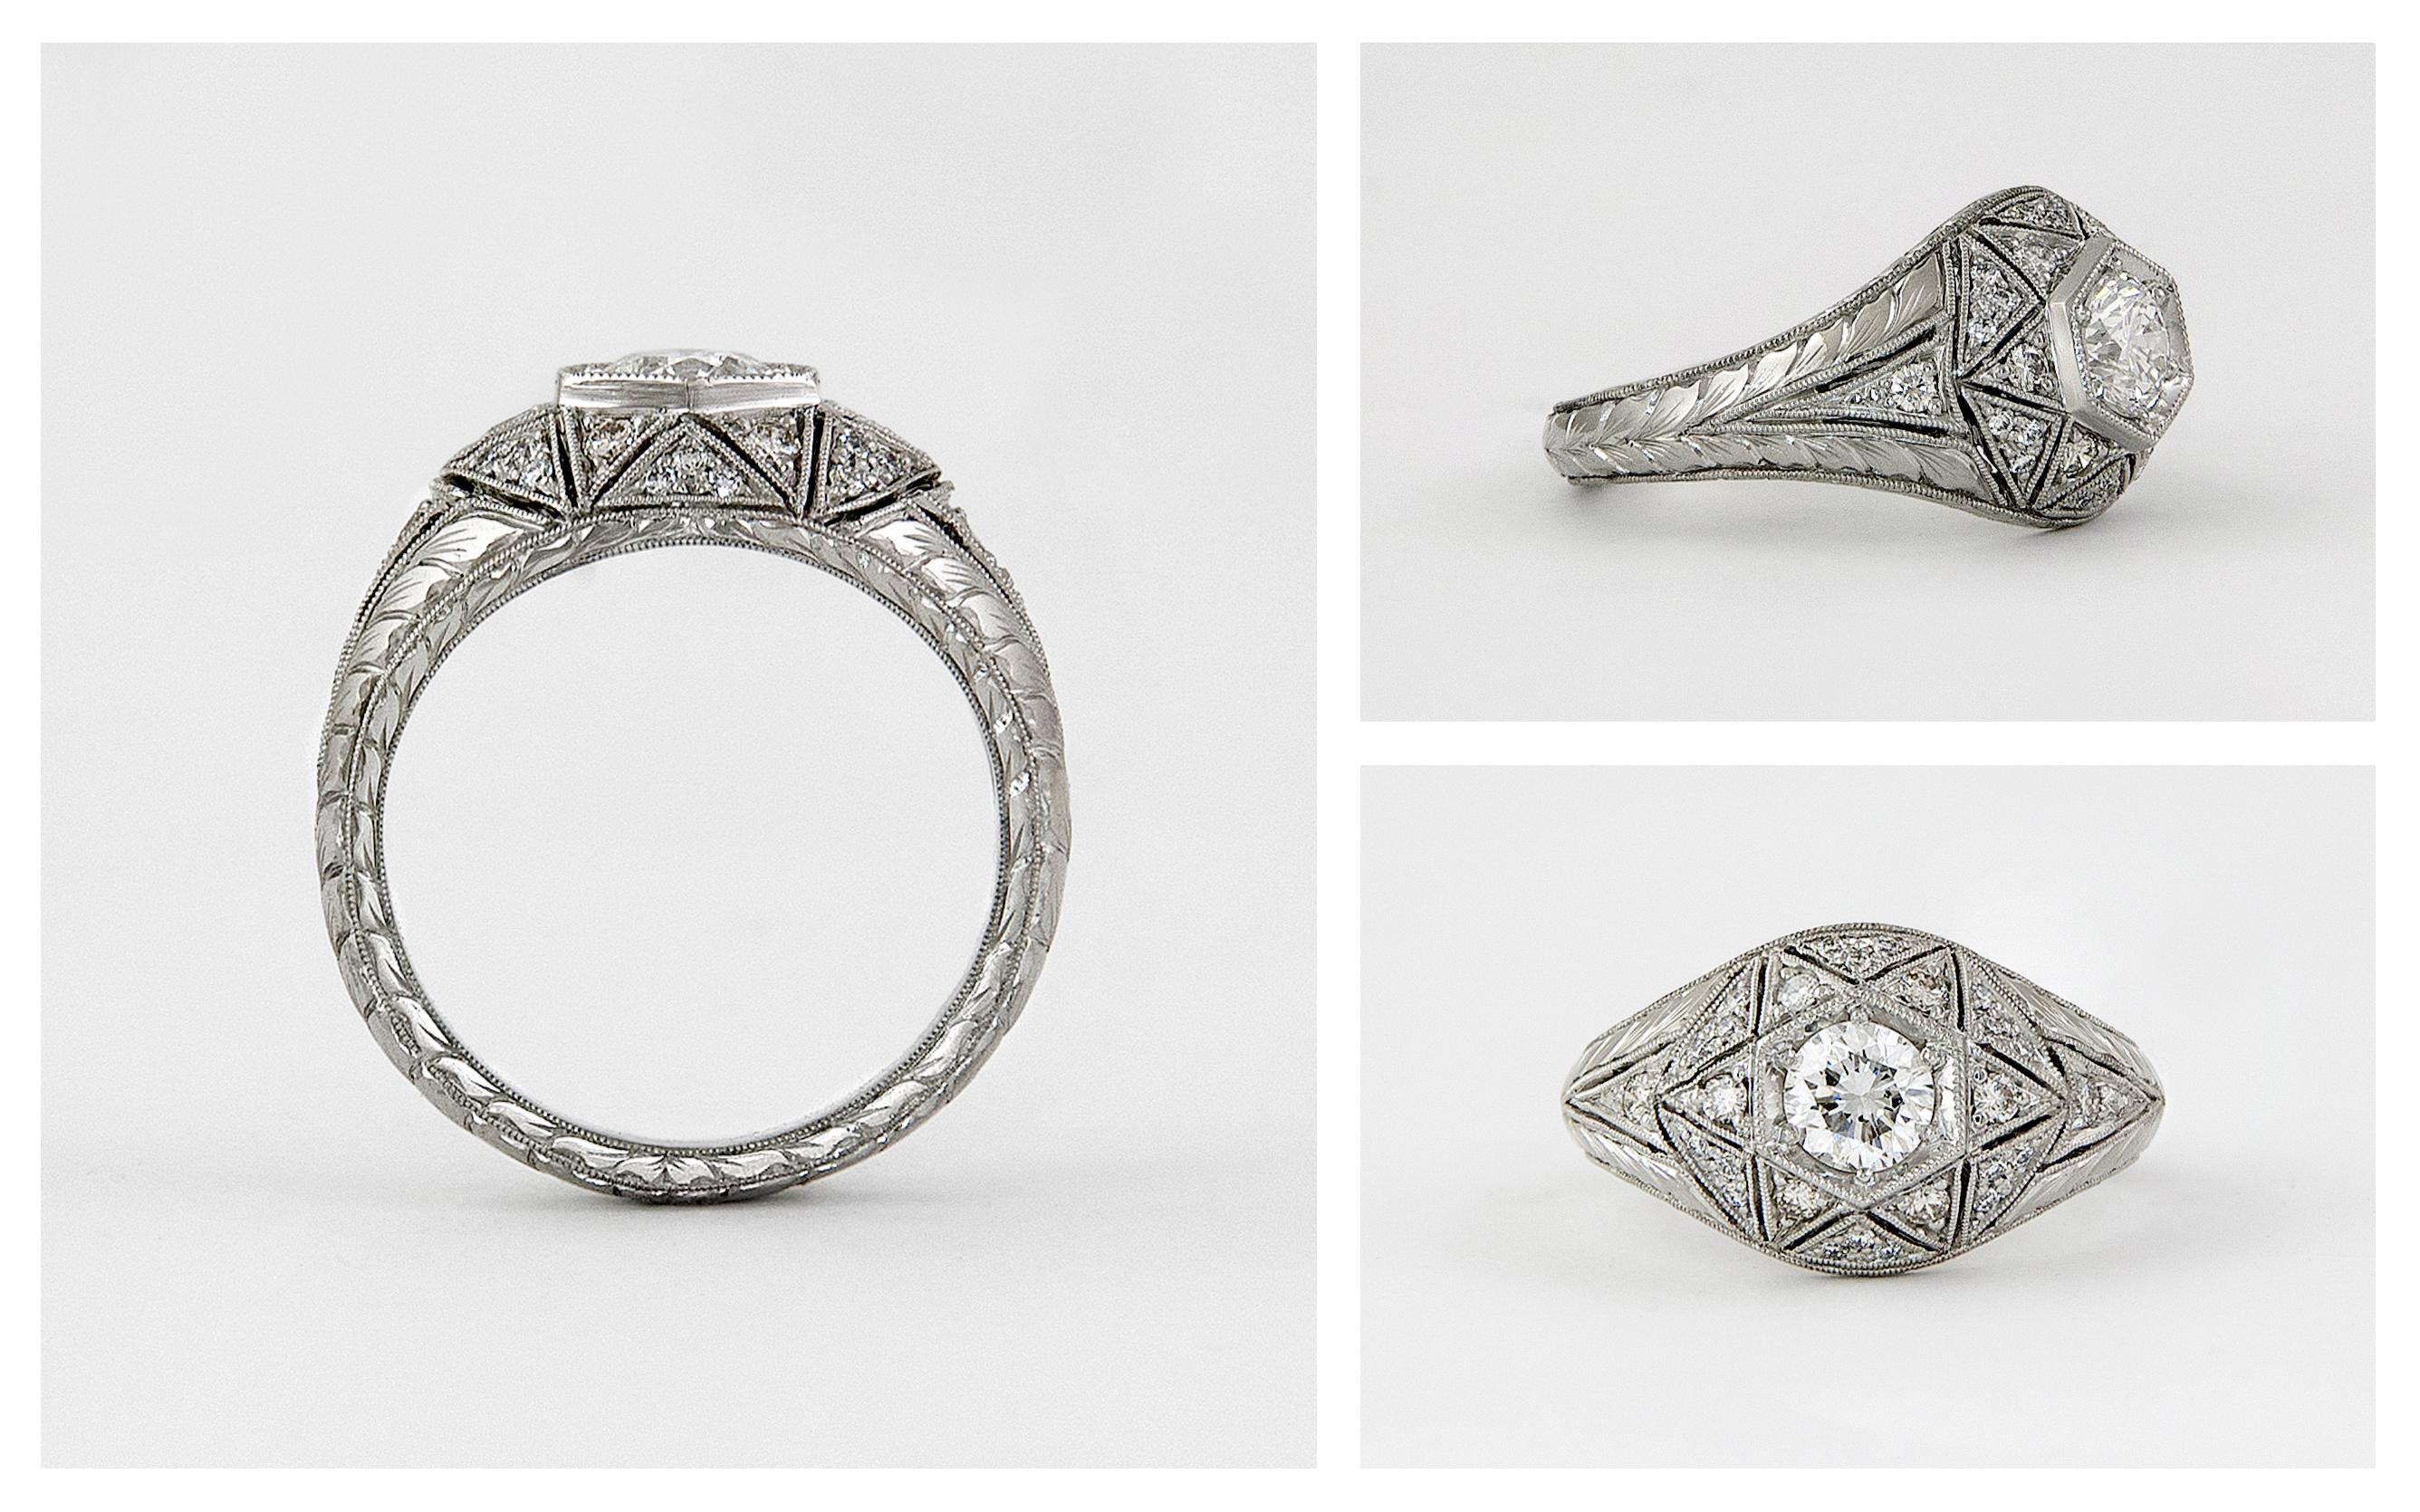 Hand Engraved Hand Pierced Diamond Engagement Ring